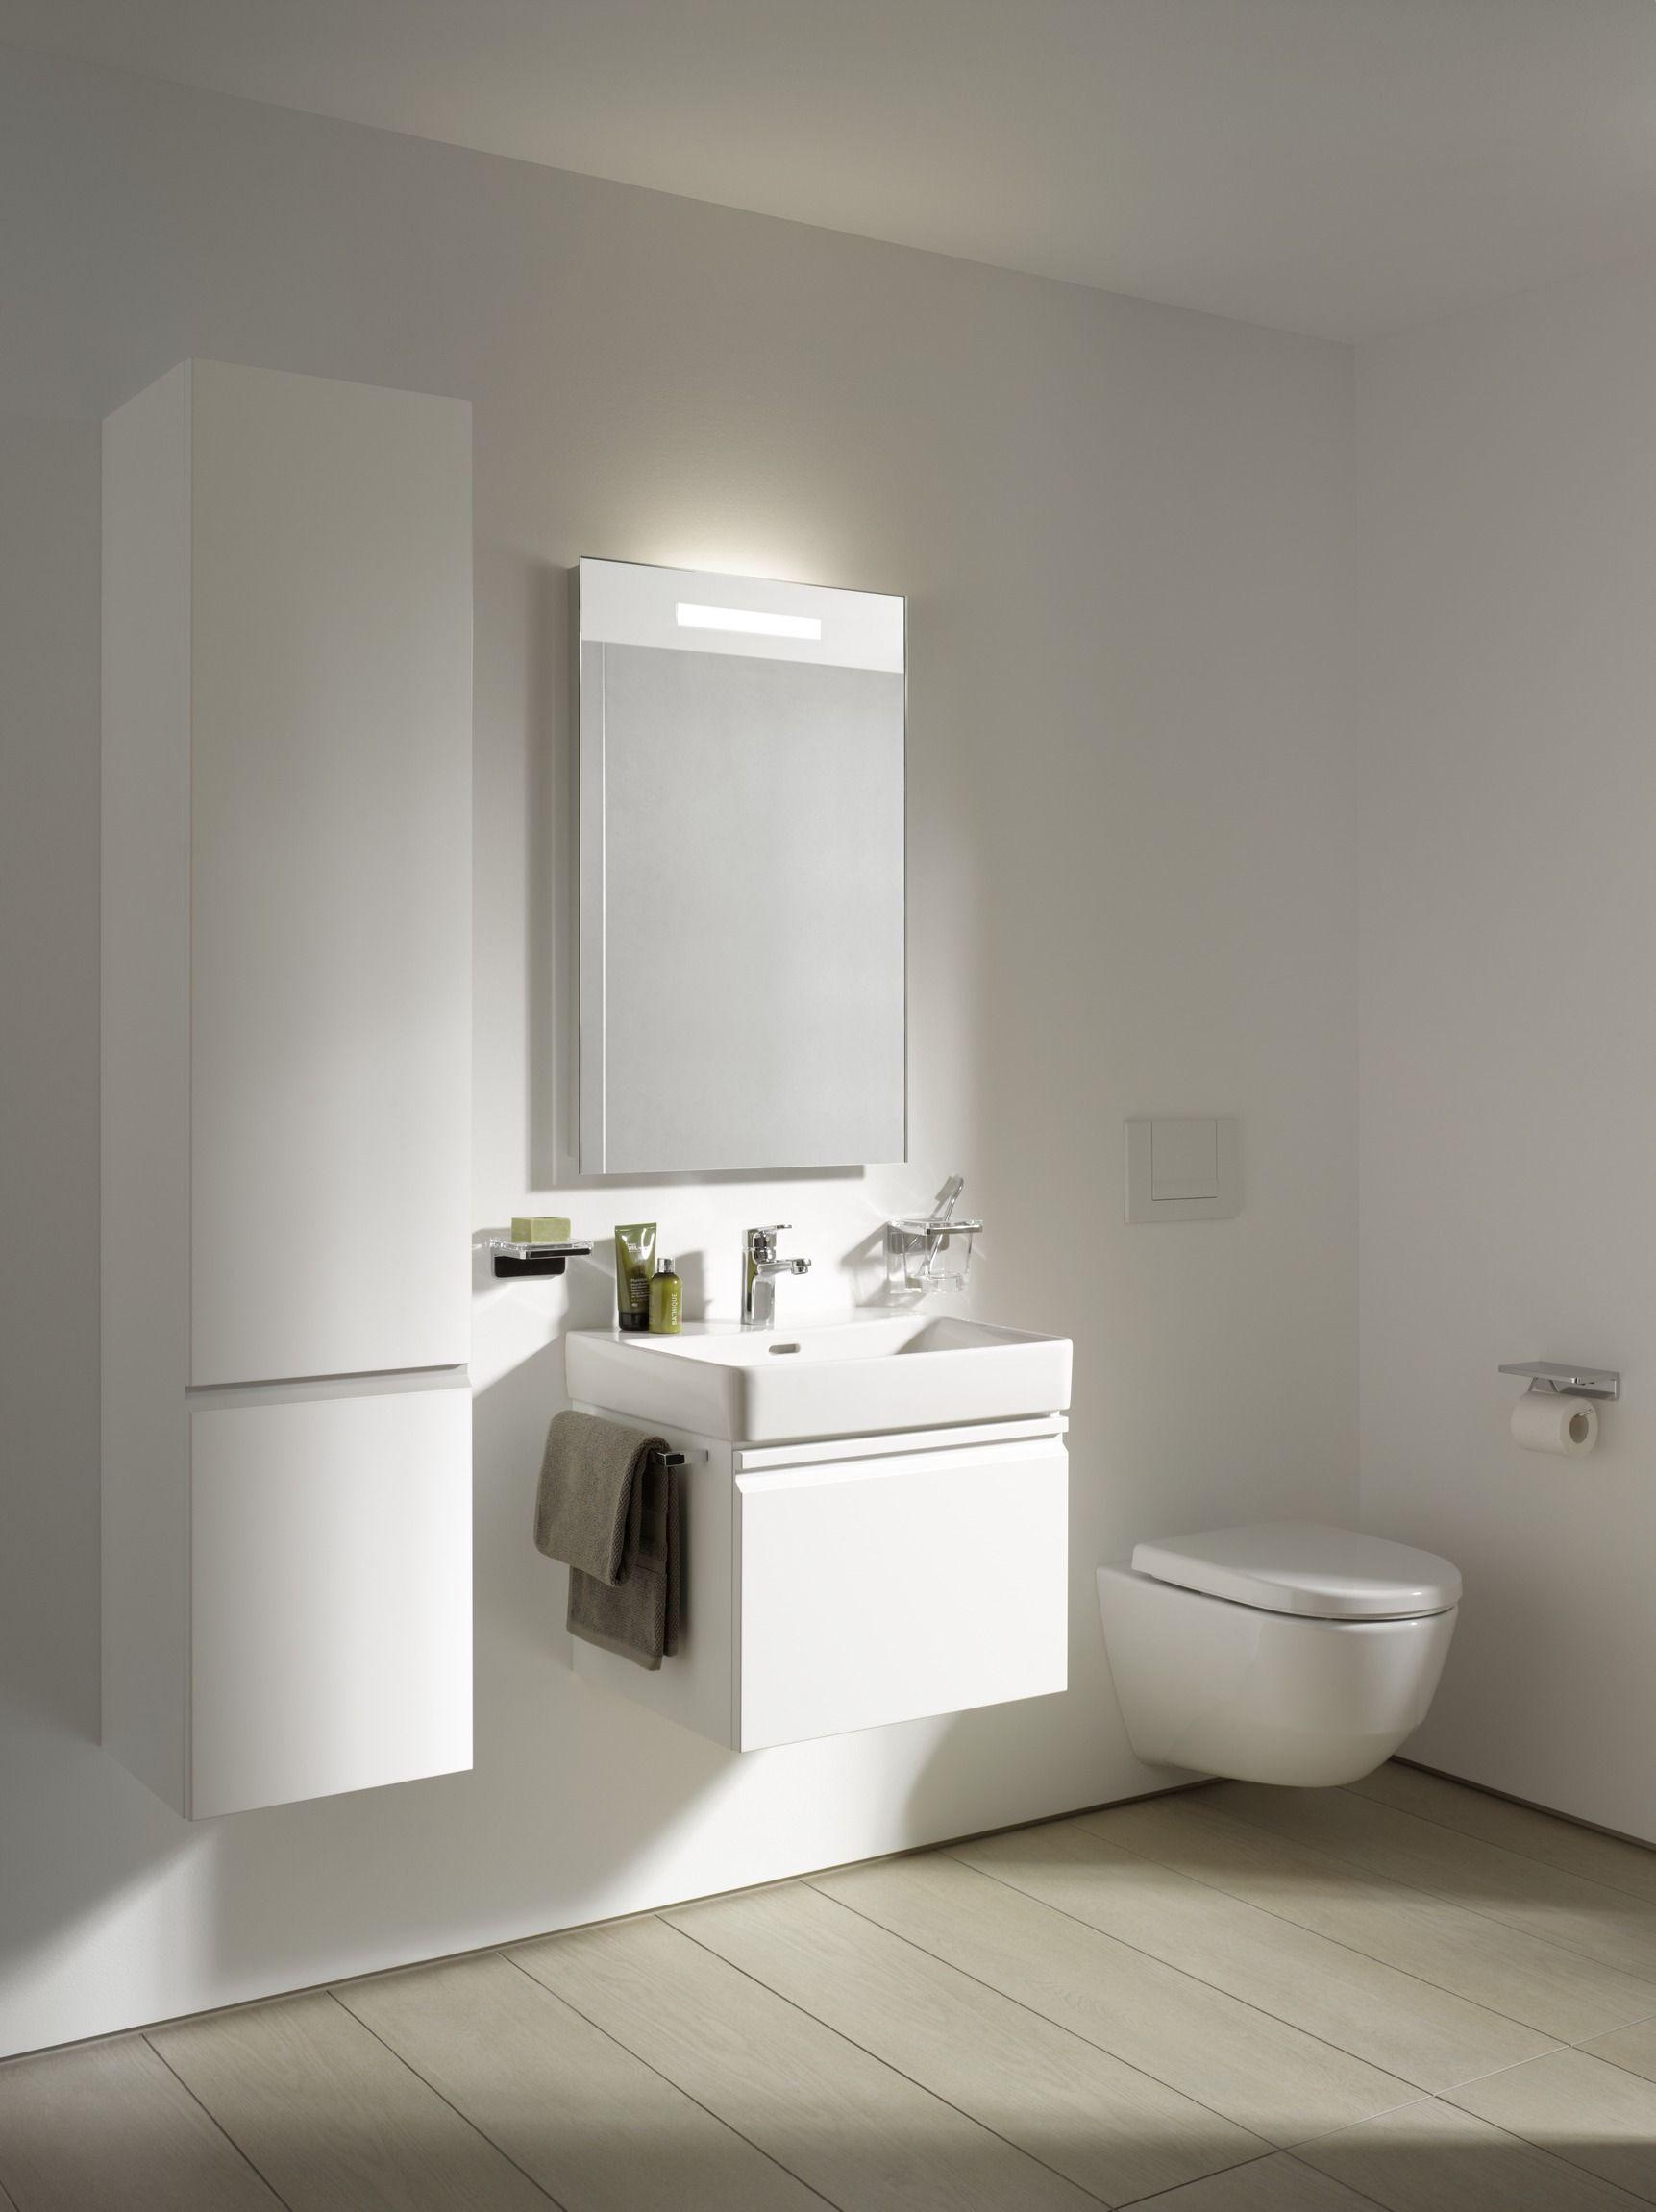 Laufen Pro S Laufen Bathrooms Laufen Bathroom Bathroom Inspiration Minimal Bathroom